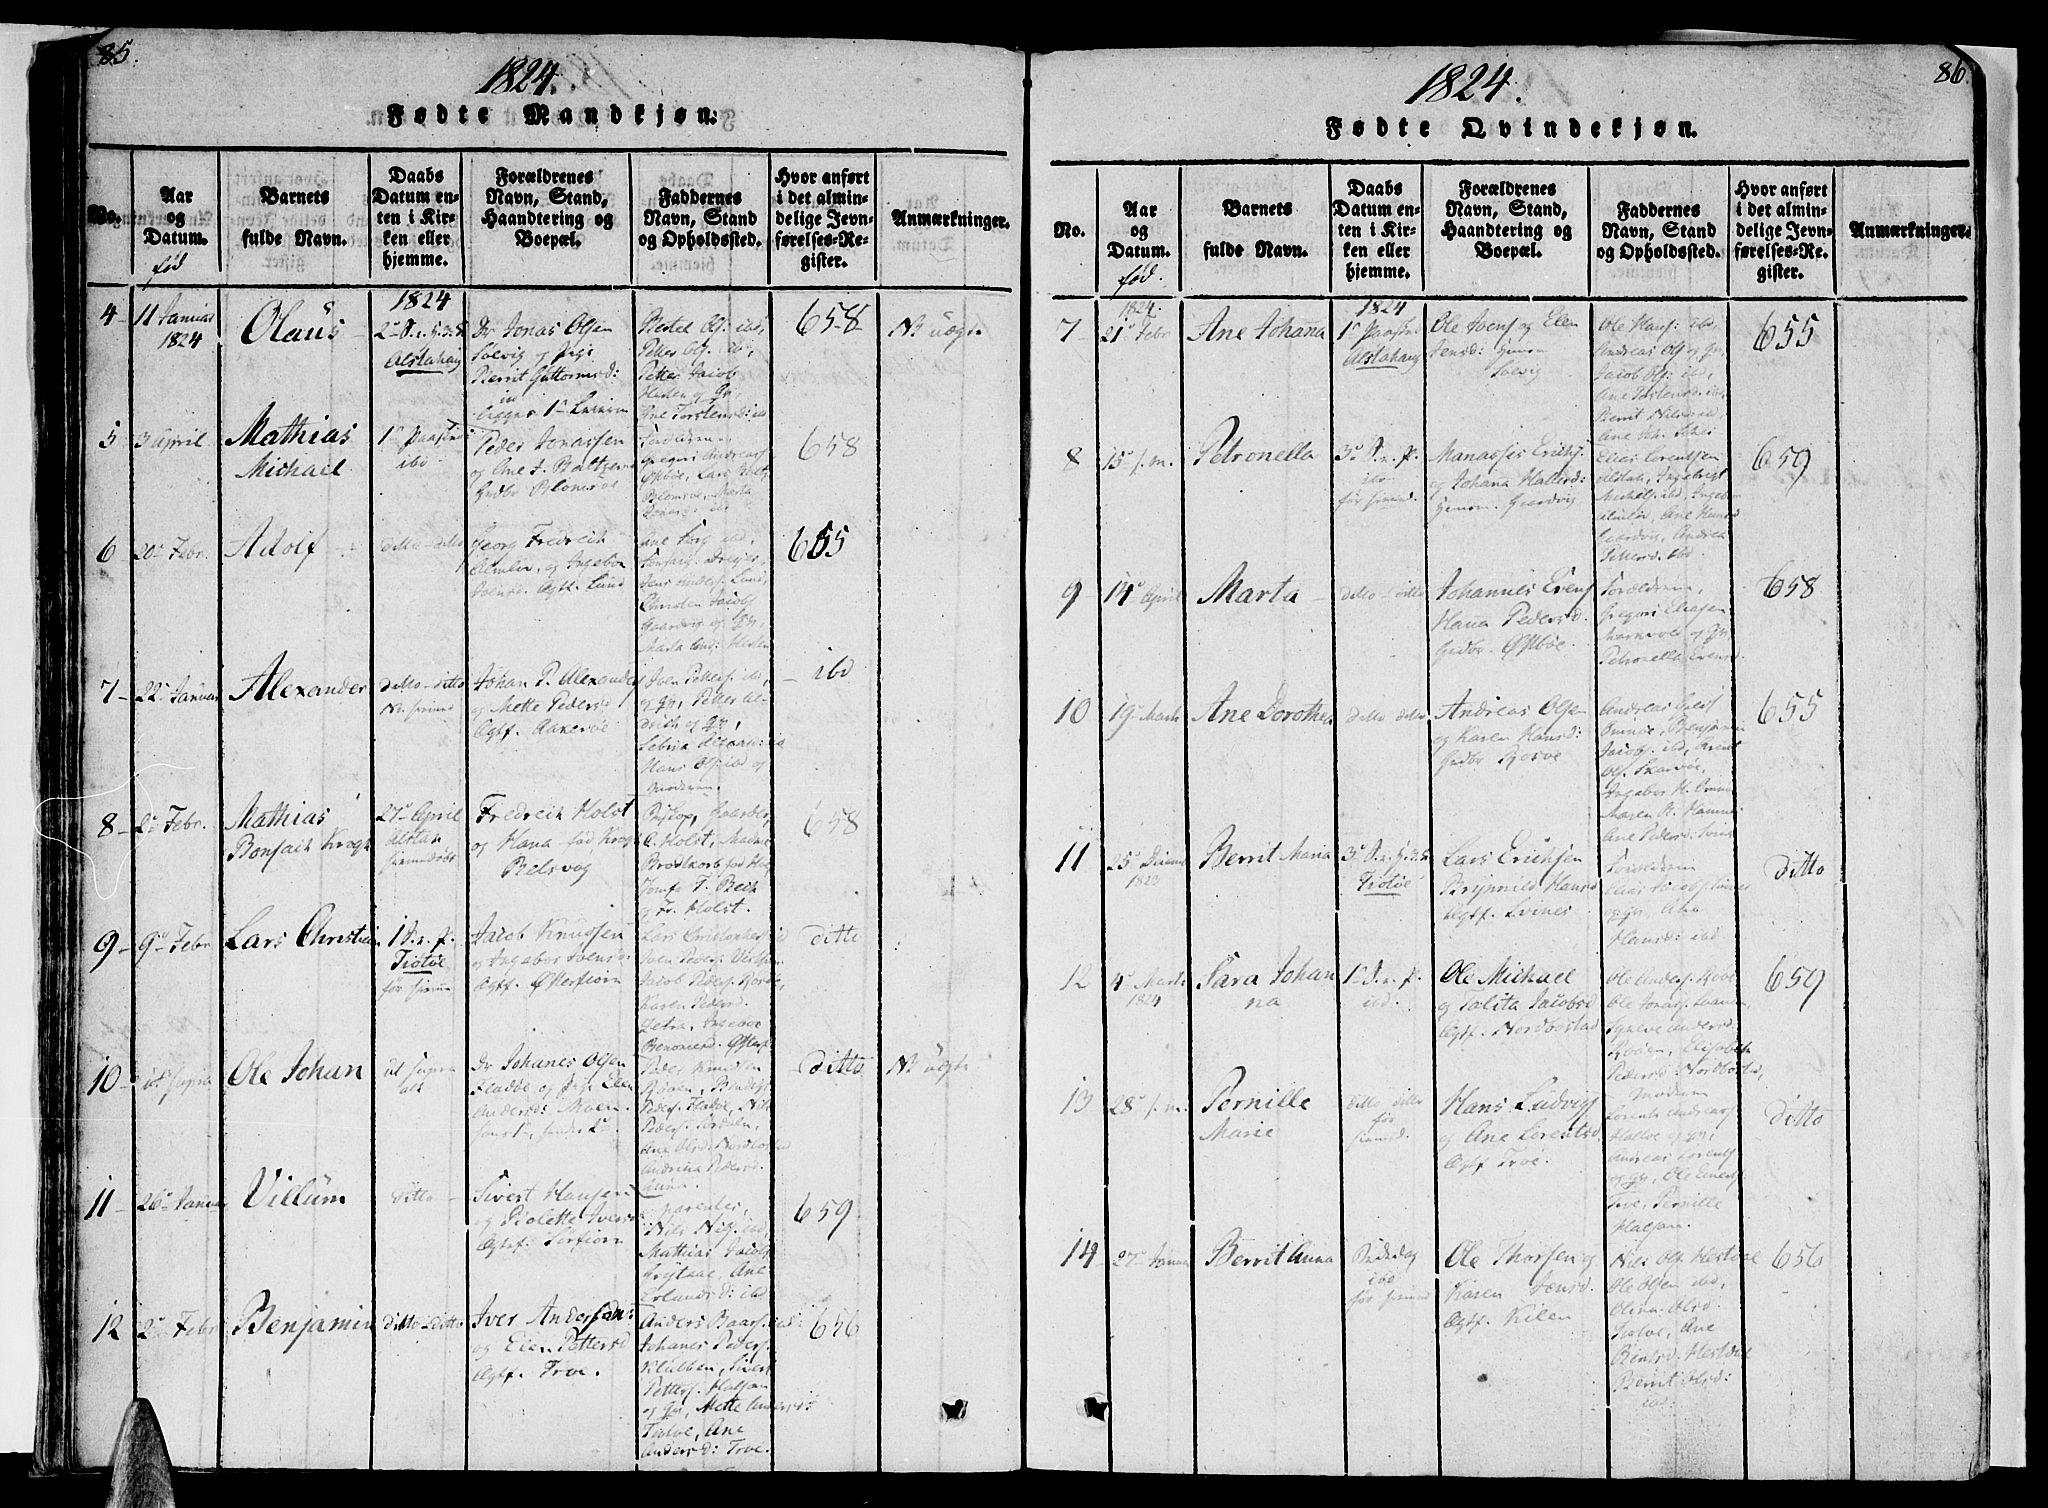 SAT, Ministerialprotokoller, klokkerbøker og fødselsregistre - Nordland, 830/L0445: Ministerialbok nr. 830A09, 1820-1830, s. 85-86